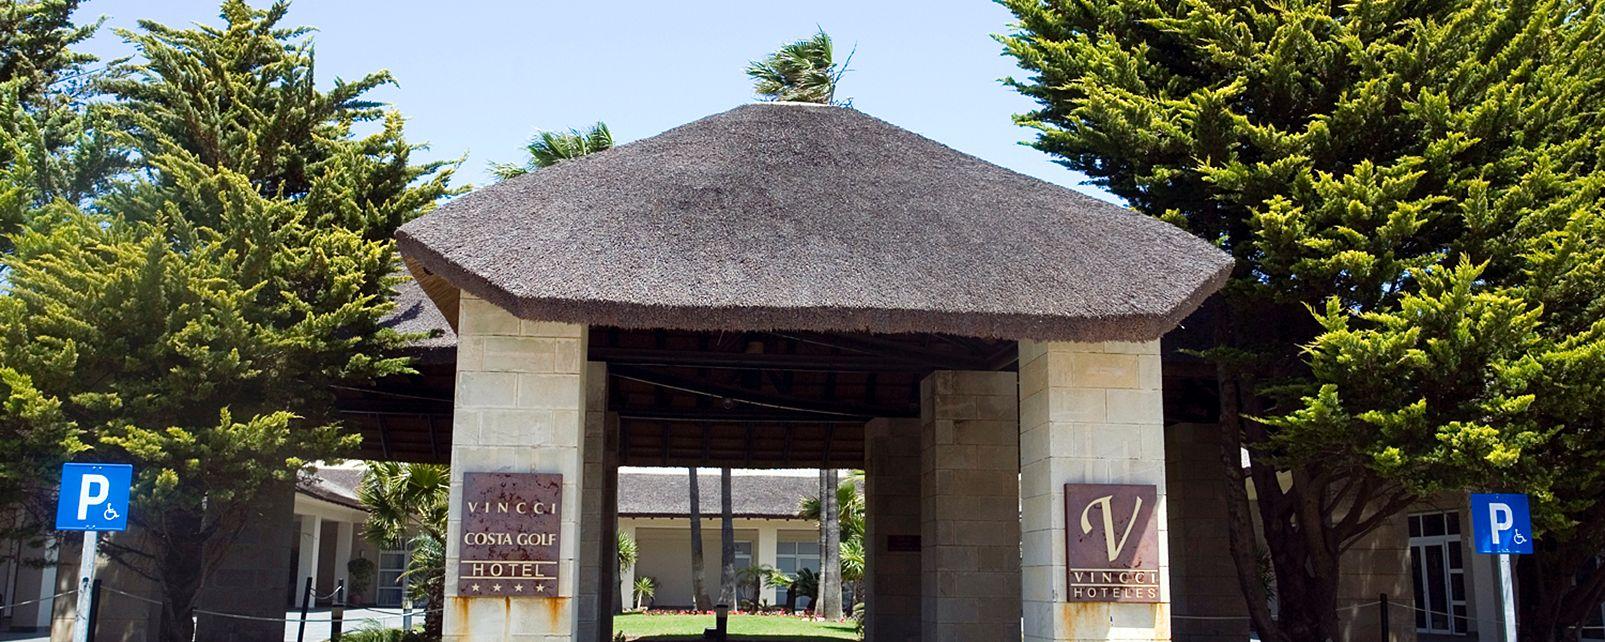 Hôtel Vincci Costa Golf